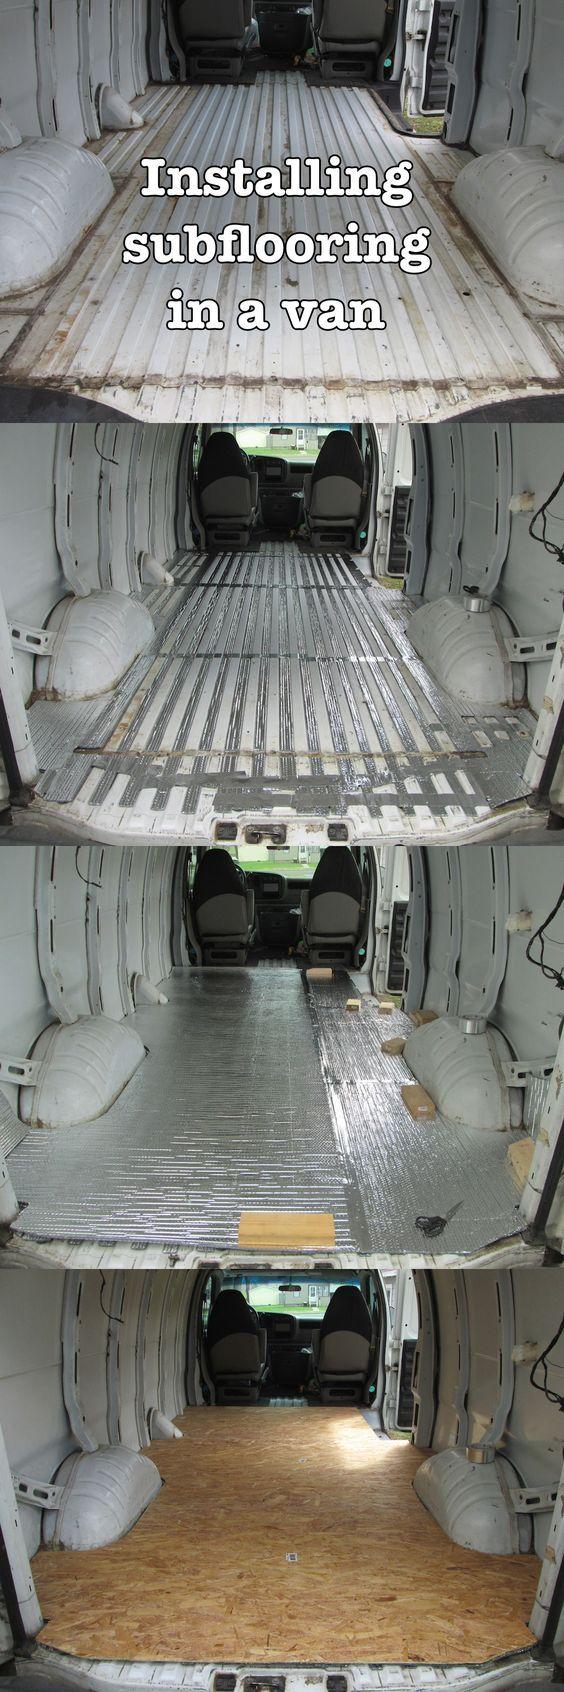 Installing a subfloor in a camper van:                                                                                                                                                                                 More